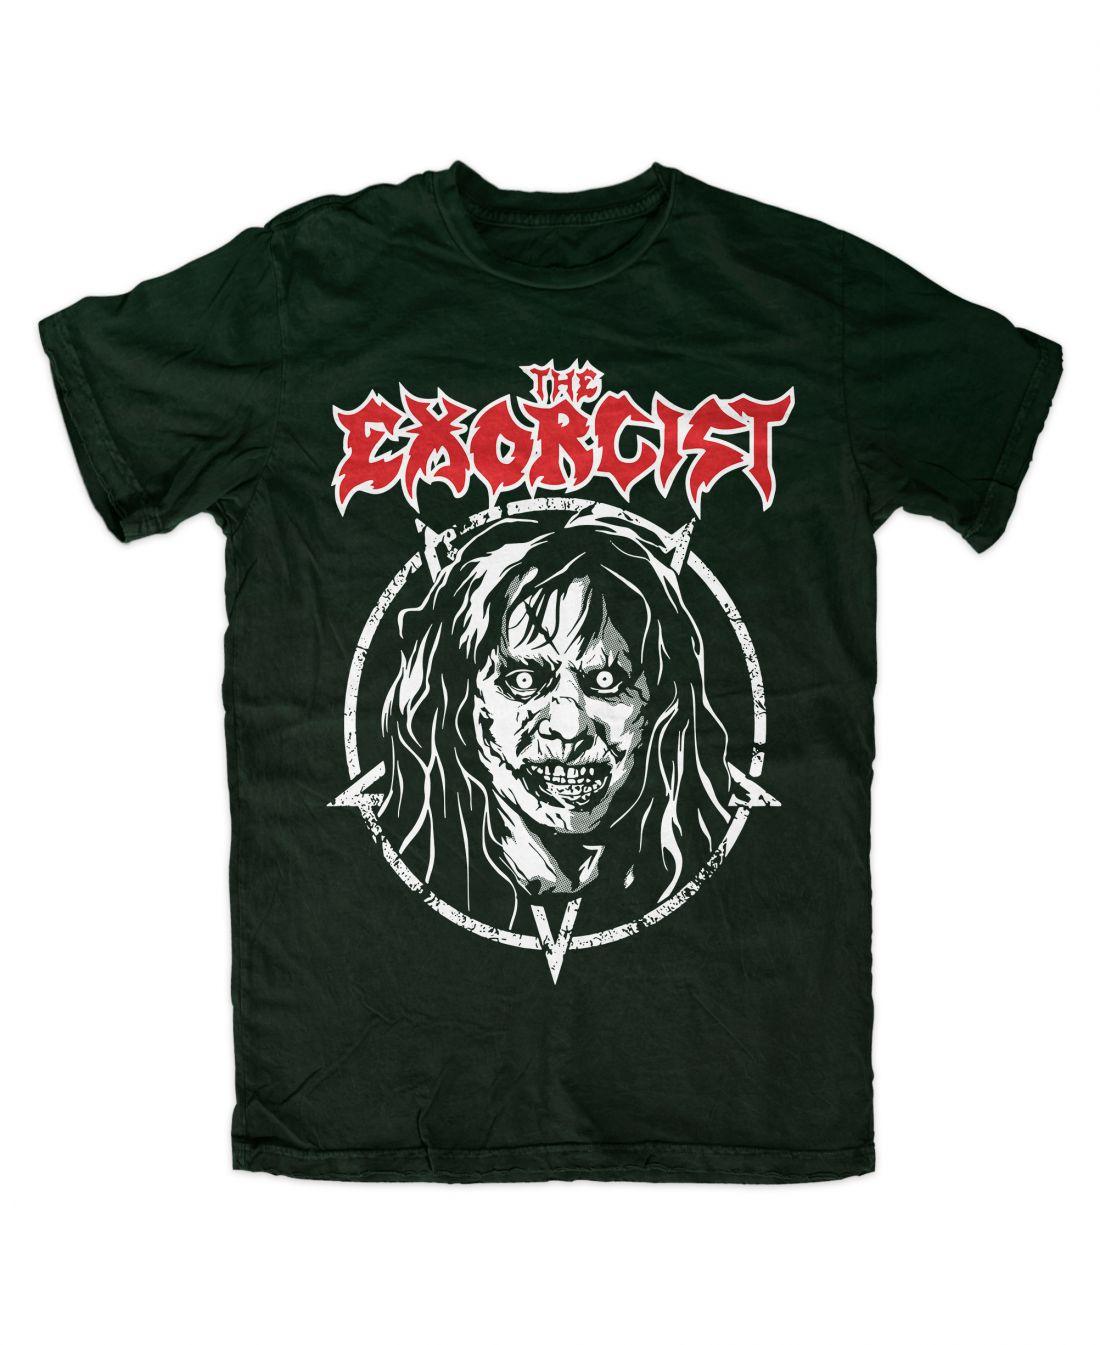 The Exorcist 001 metal series (forest green póló)